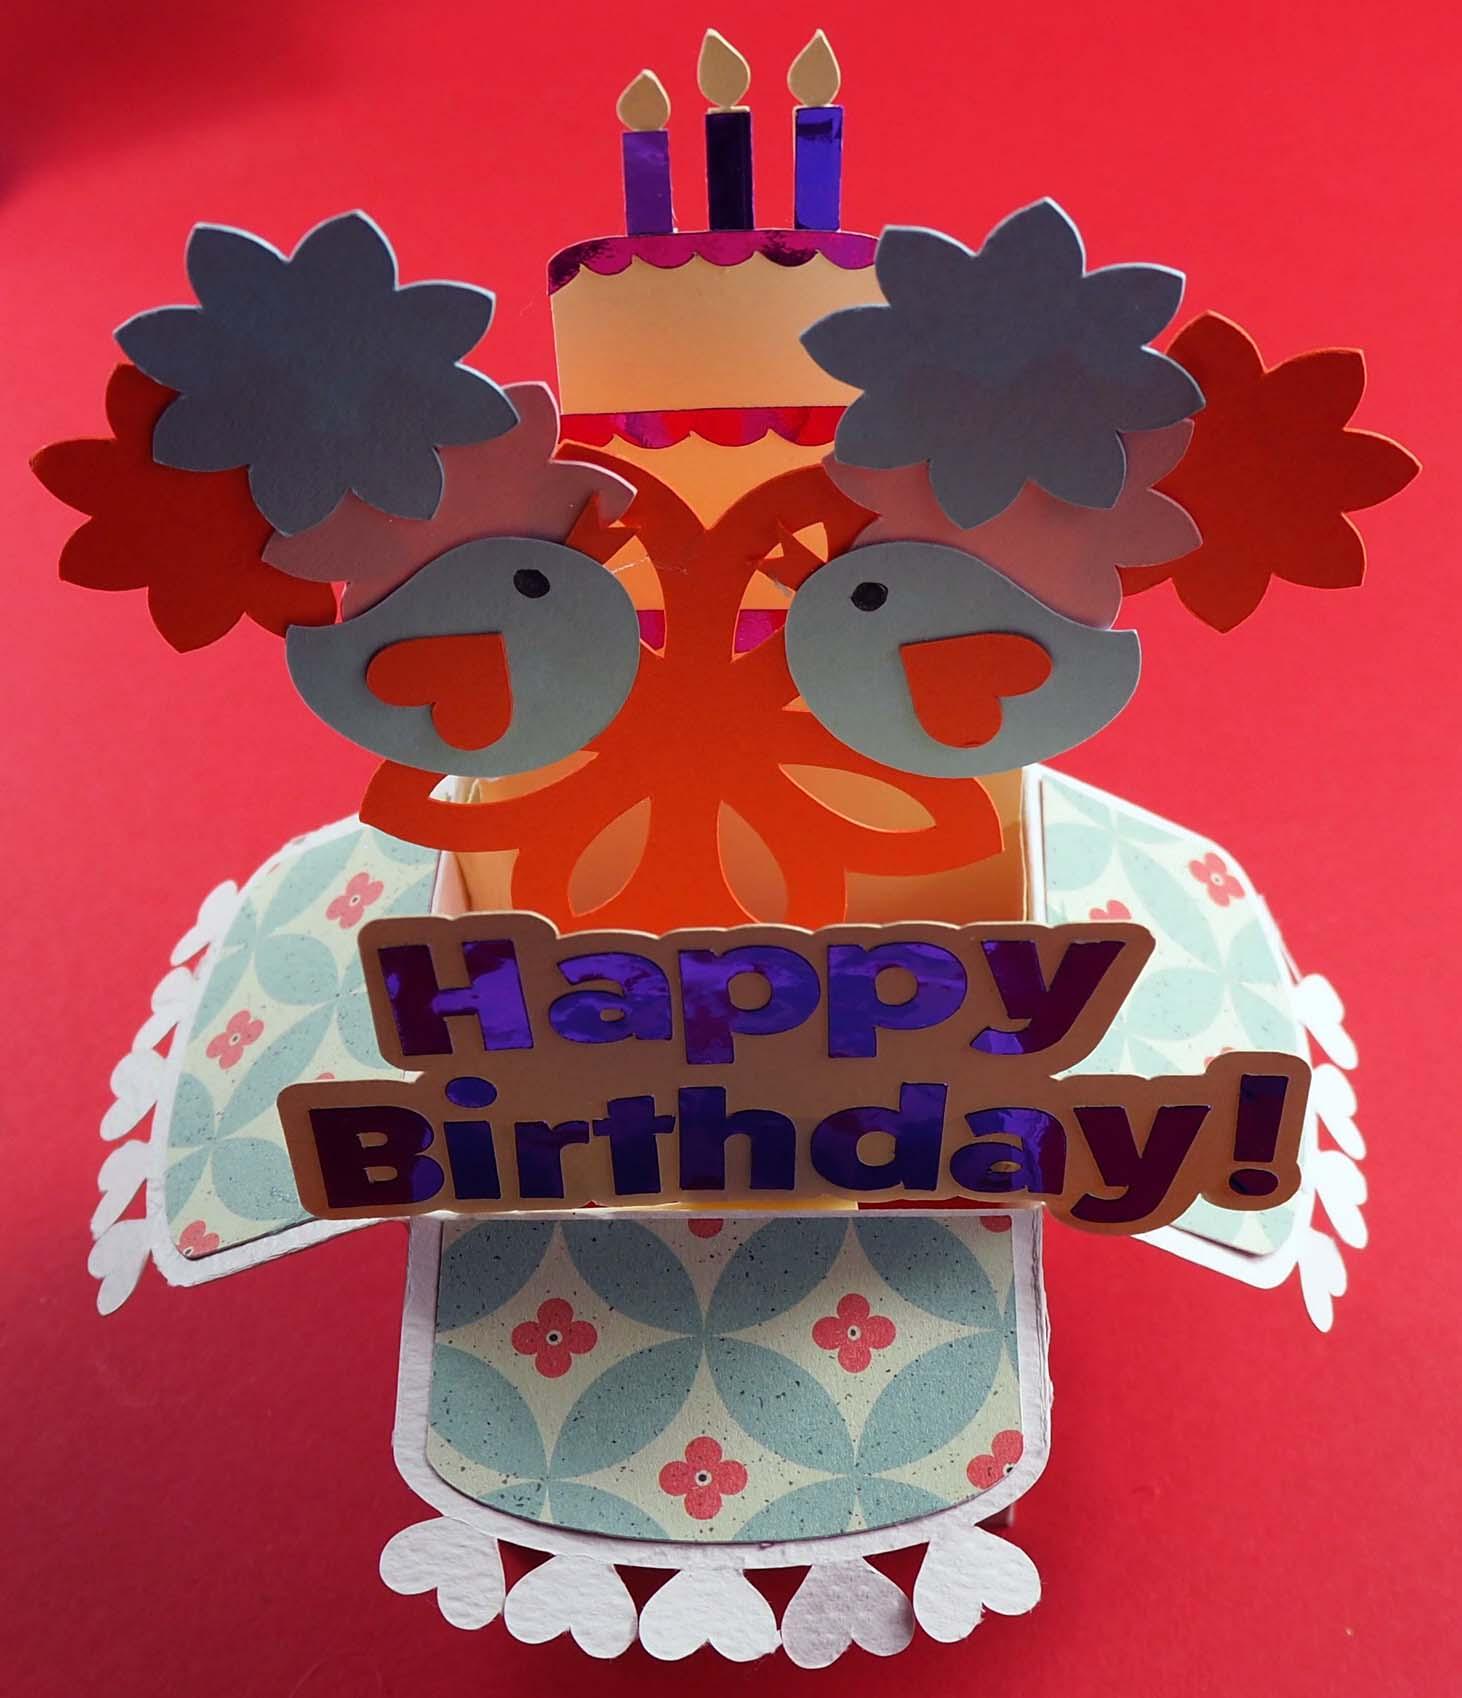 Pop-up Box Cricut Birthday Card